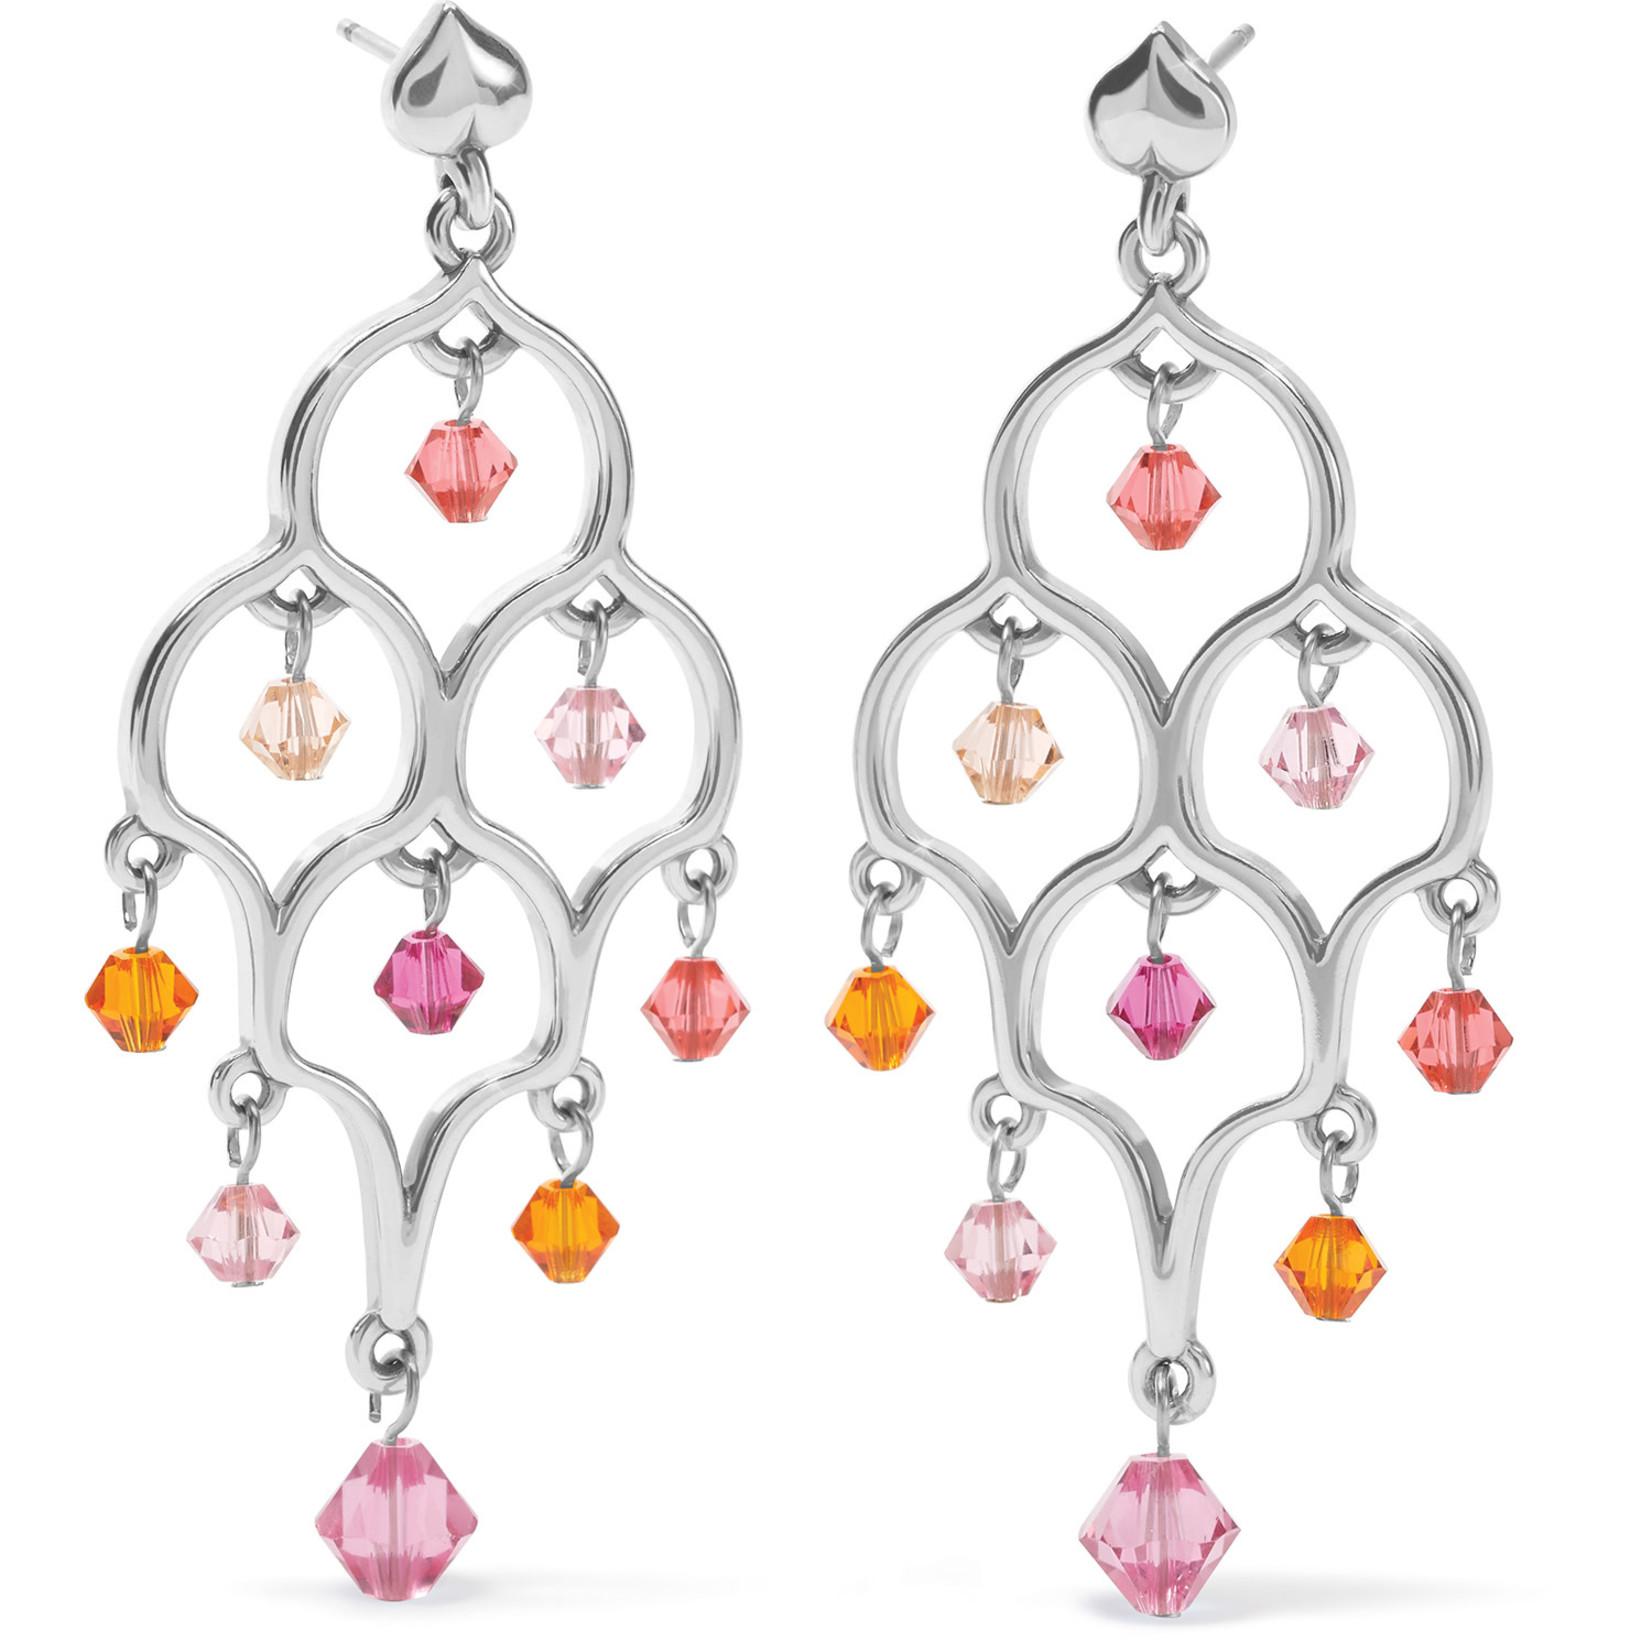 Brighton Prism Lights Sparkle Post Drop Earrings - PinkOrange